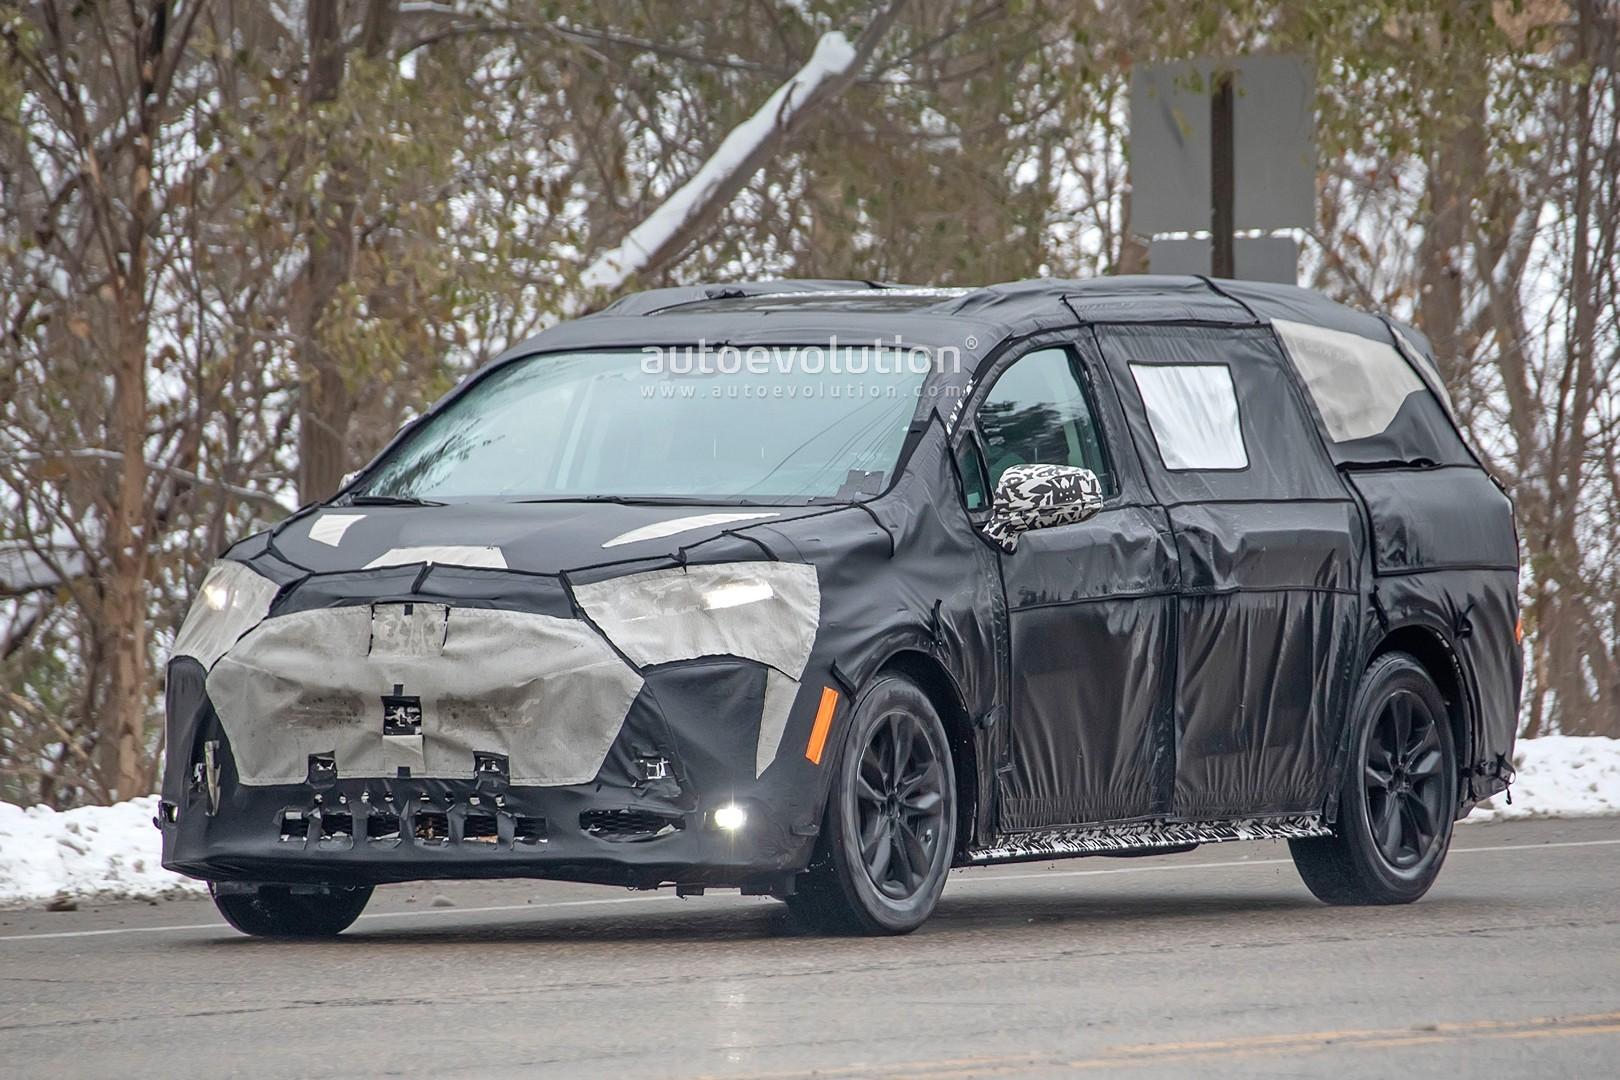 2020 - [Toyota] Sienna  2021-toyota-sienna-spied-testing-in-detroit-looks-like-a-bigger-modern-minivan_3